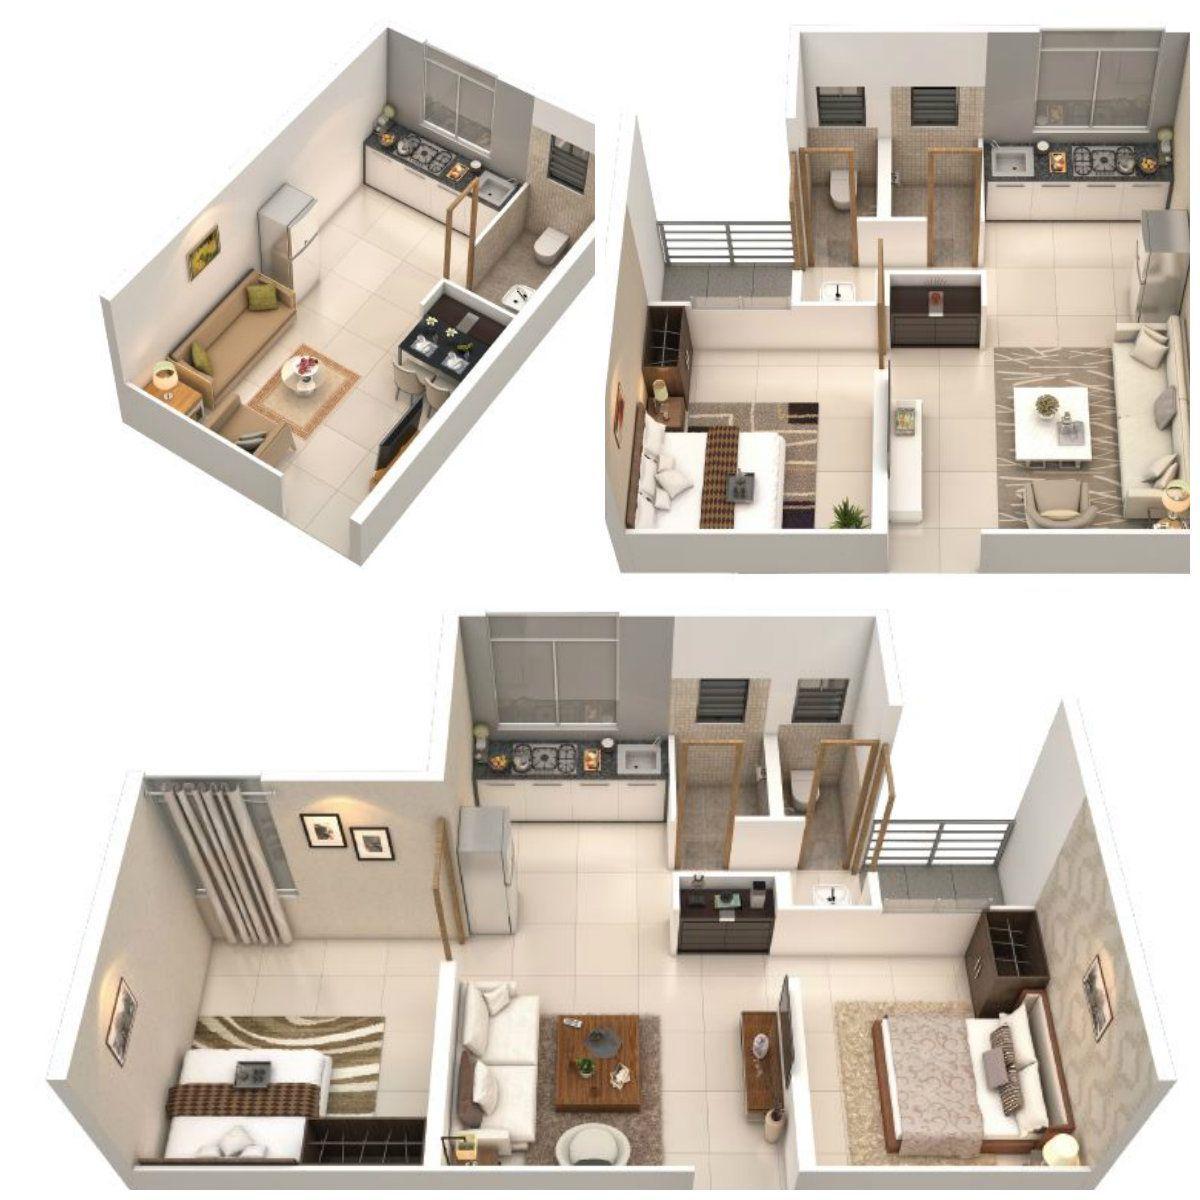 Vascon New Houses In Katvi Road Talegaon Pune 1 Rk 1 2 Bedrooms For Sale In Katvi Road Talegaon Pune New Homes House House Styles